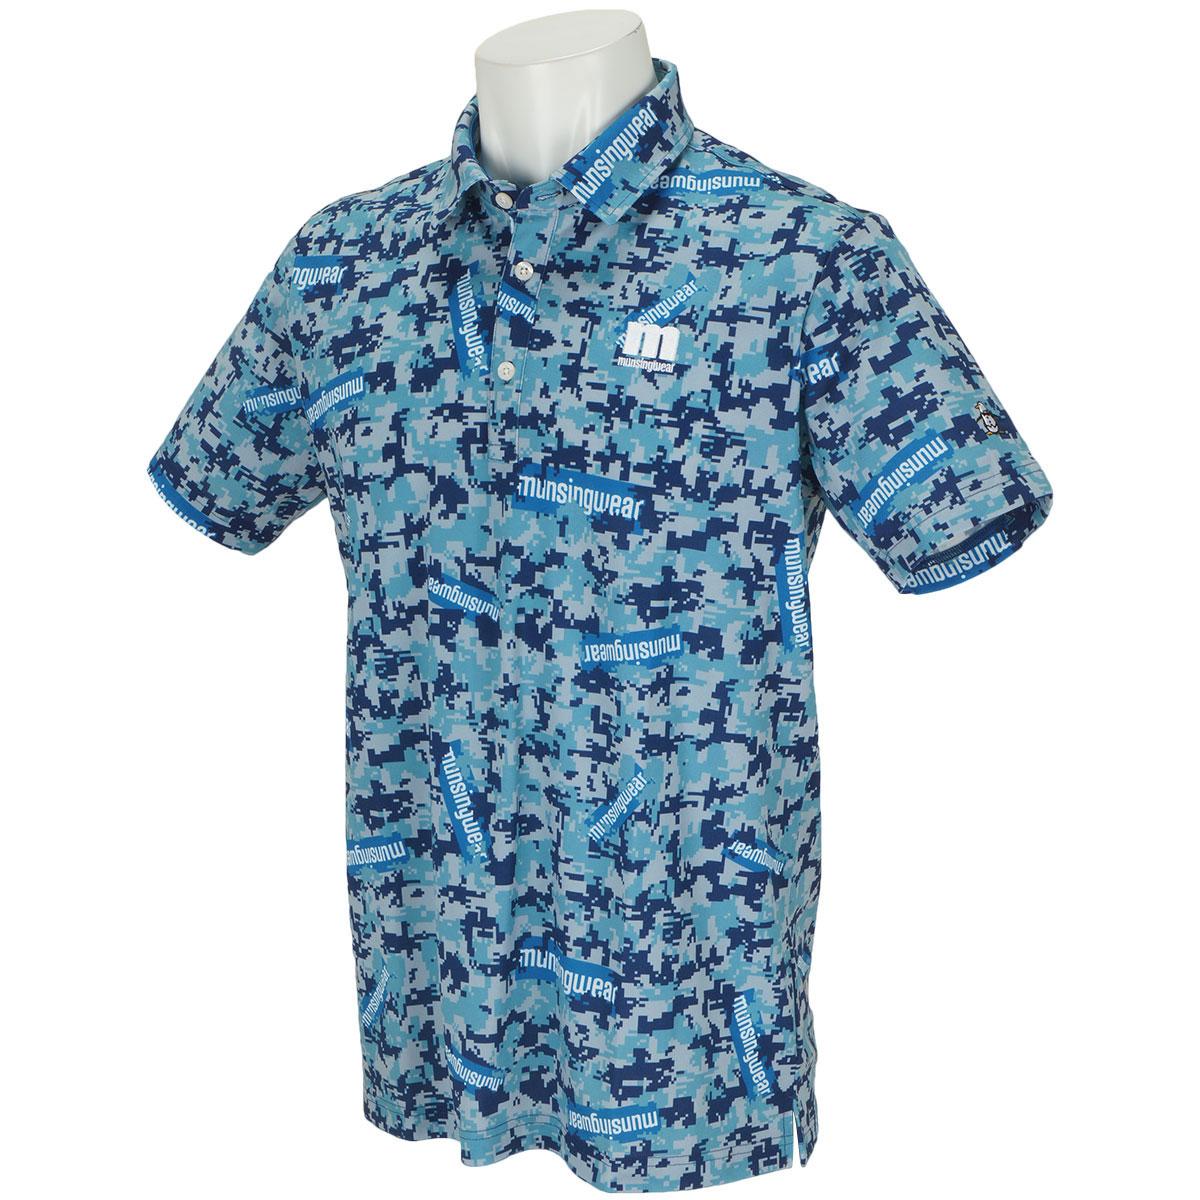 ENVOY ストレッチ ステッカーロゴ&カモフラプリント半袖ポロシャツ